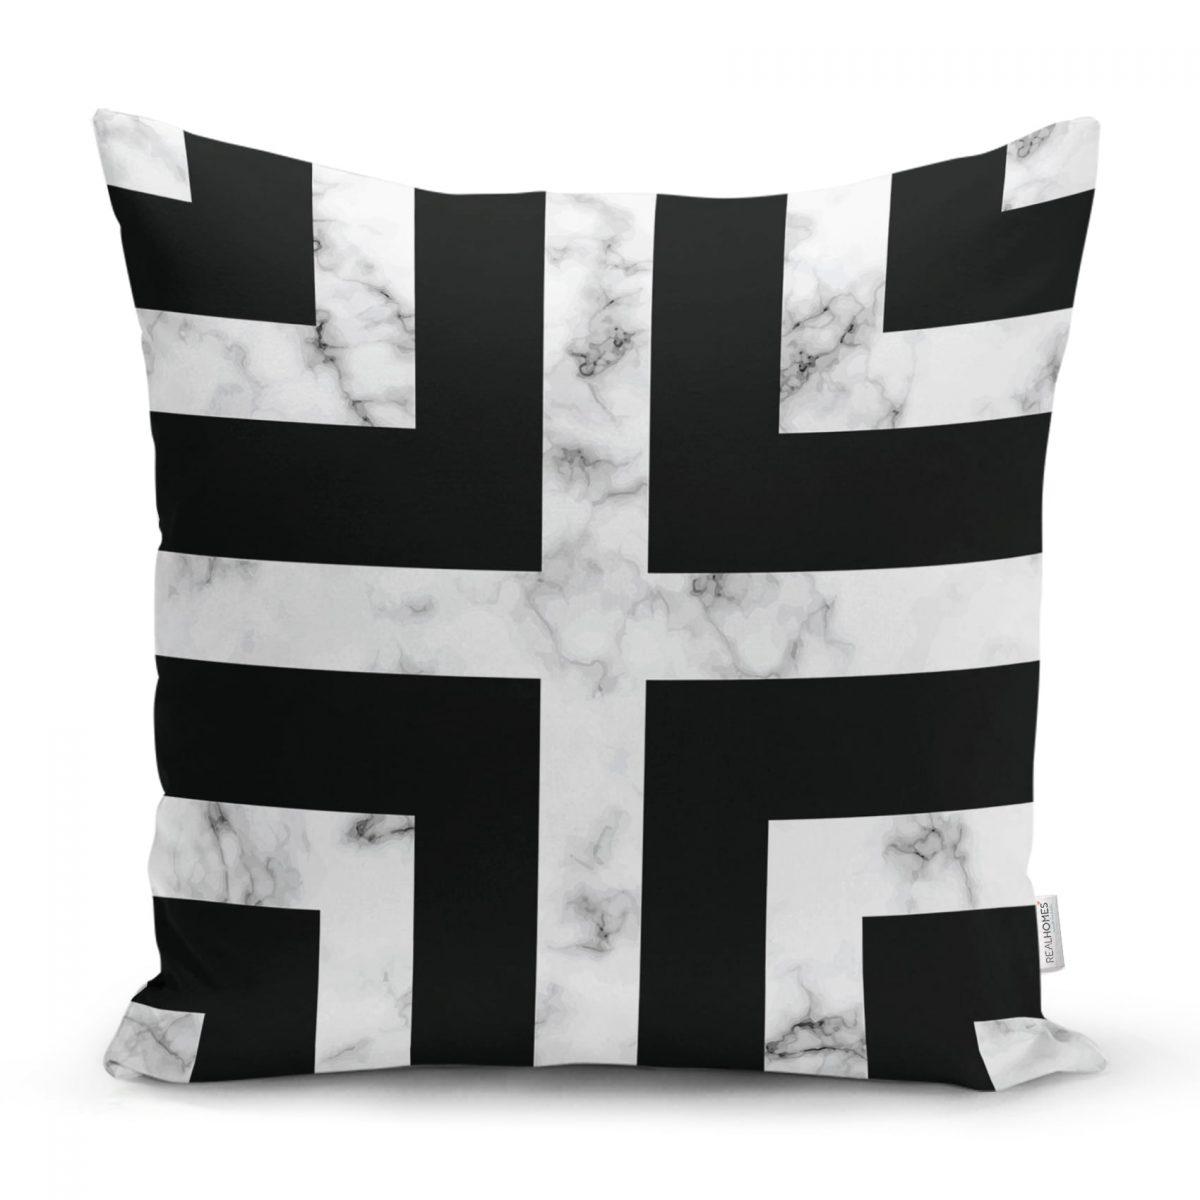 Mermer Zeminli Siyah Geometrik Desenli Modern Yastık Kırlent Kılıfı Realhomes